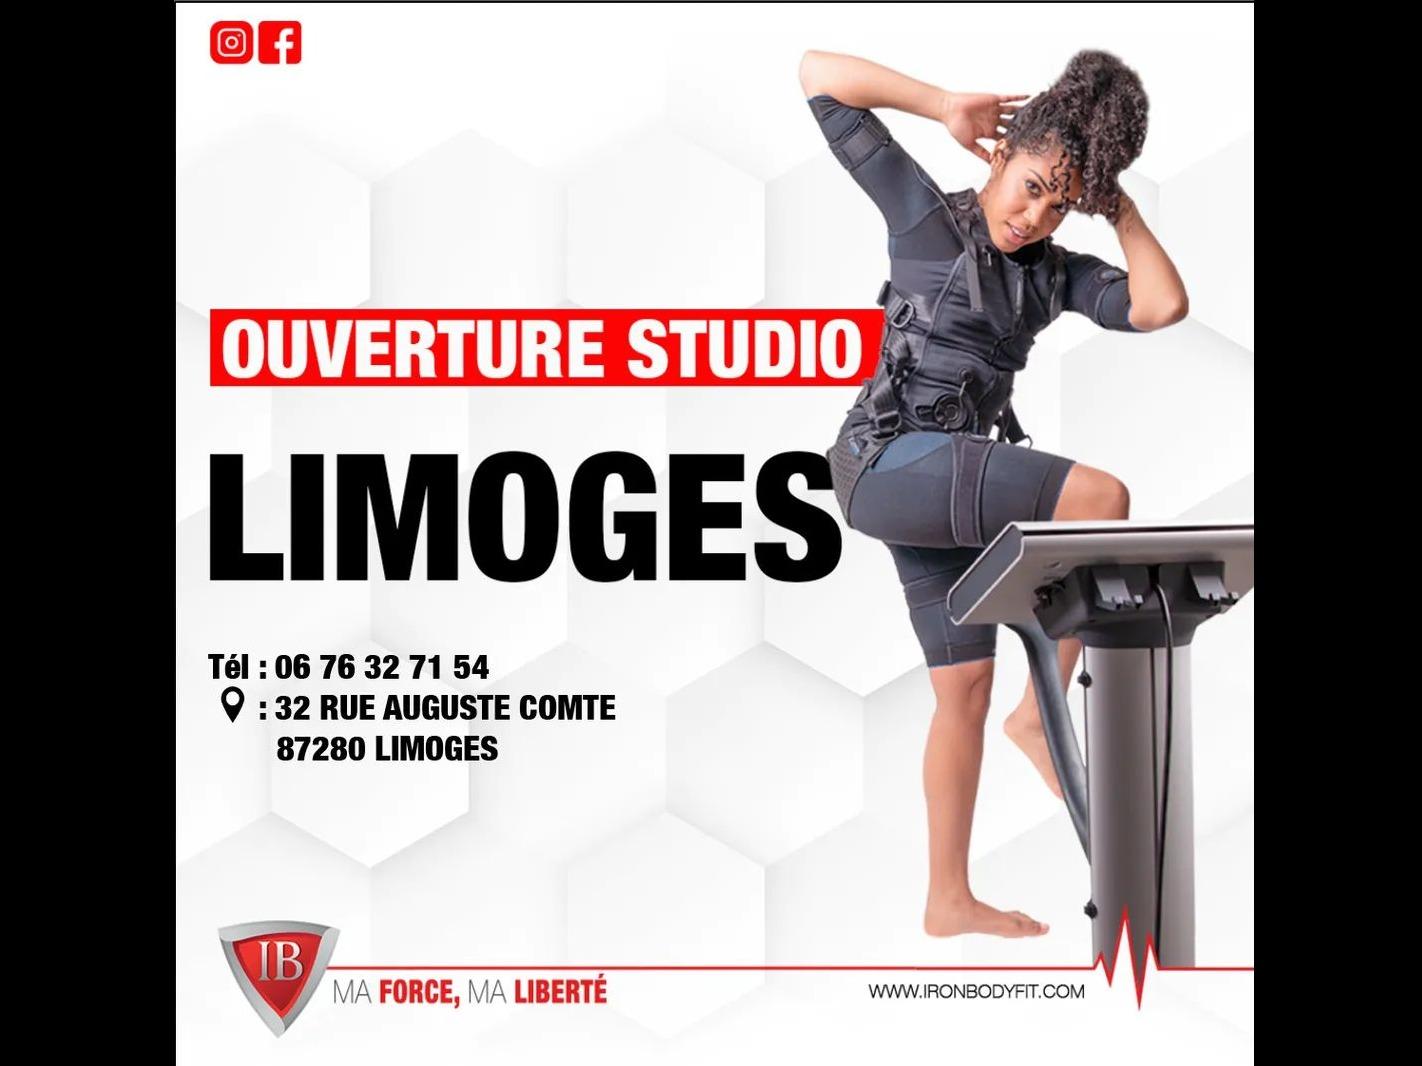 Iron Bodyfit Limoges